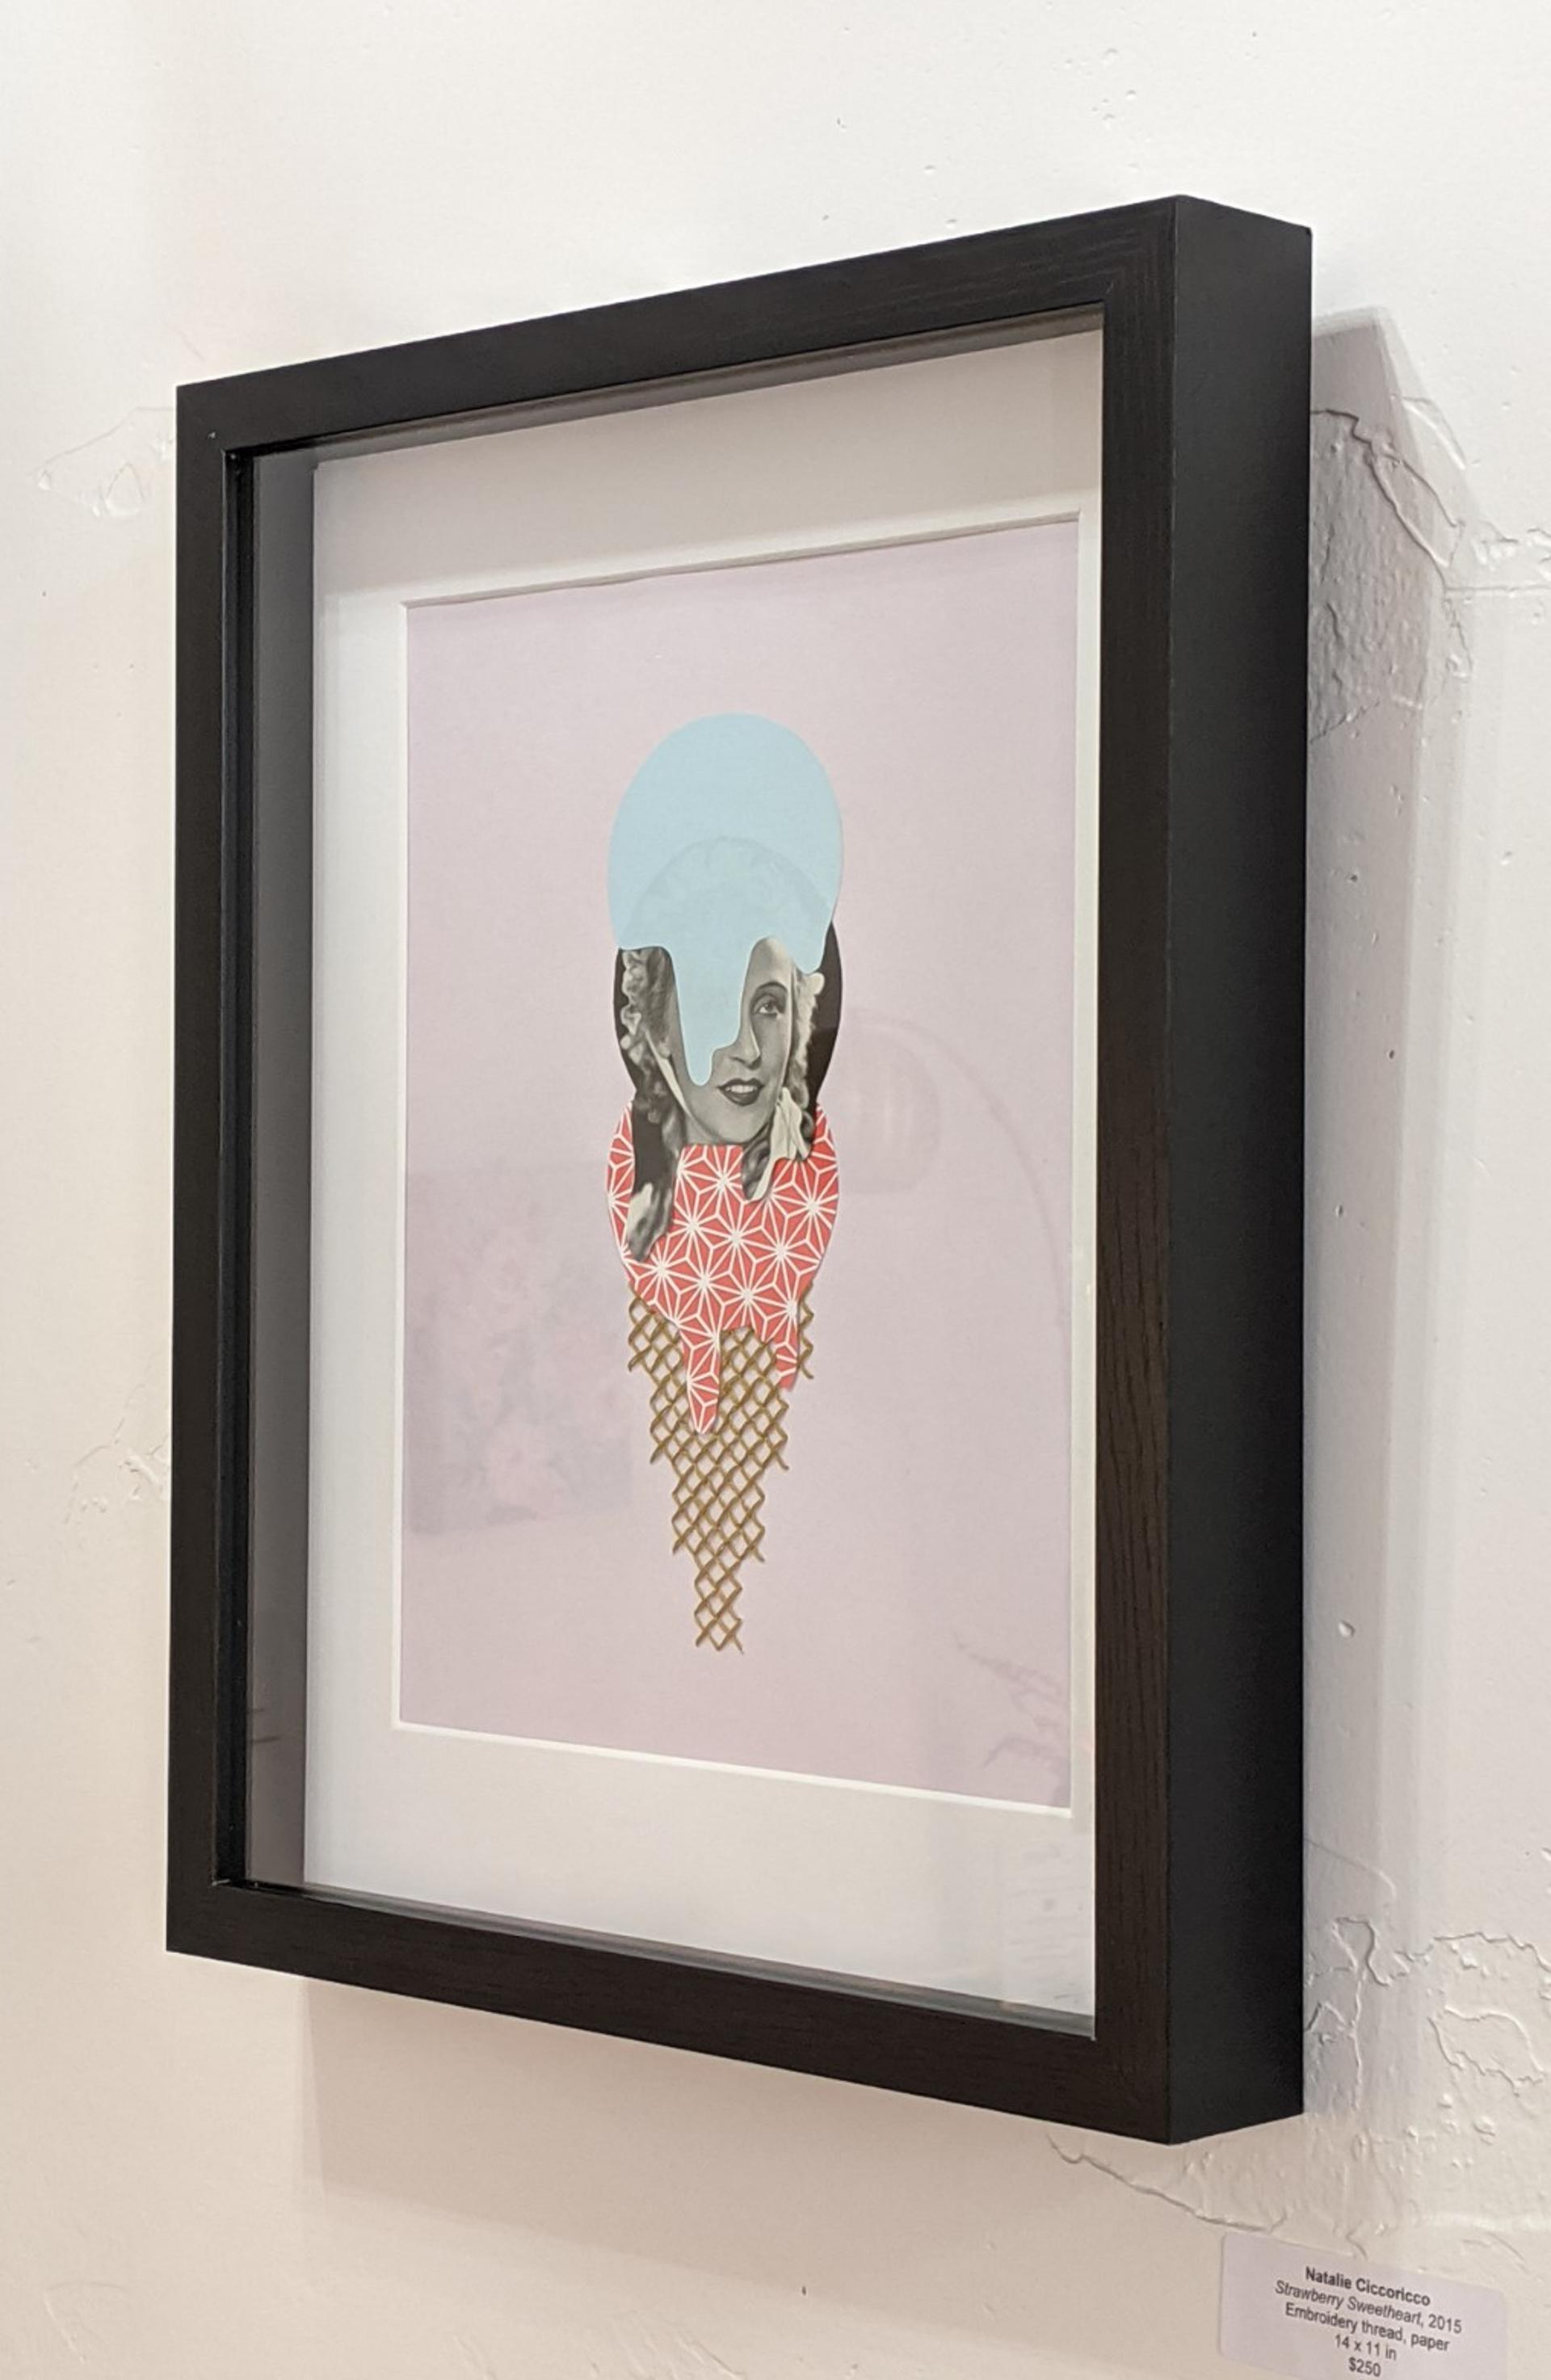 Strawberry Sweetheart by Natalie Ciccoricco